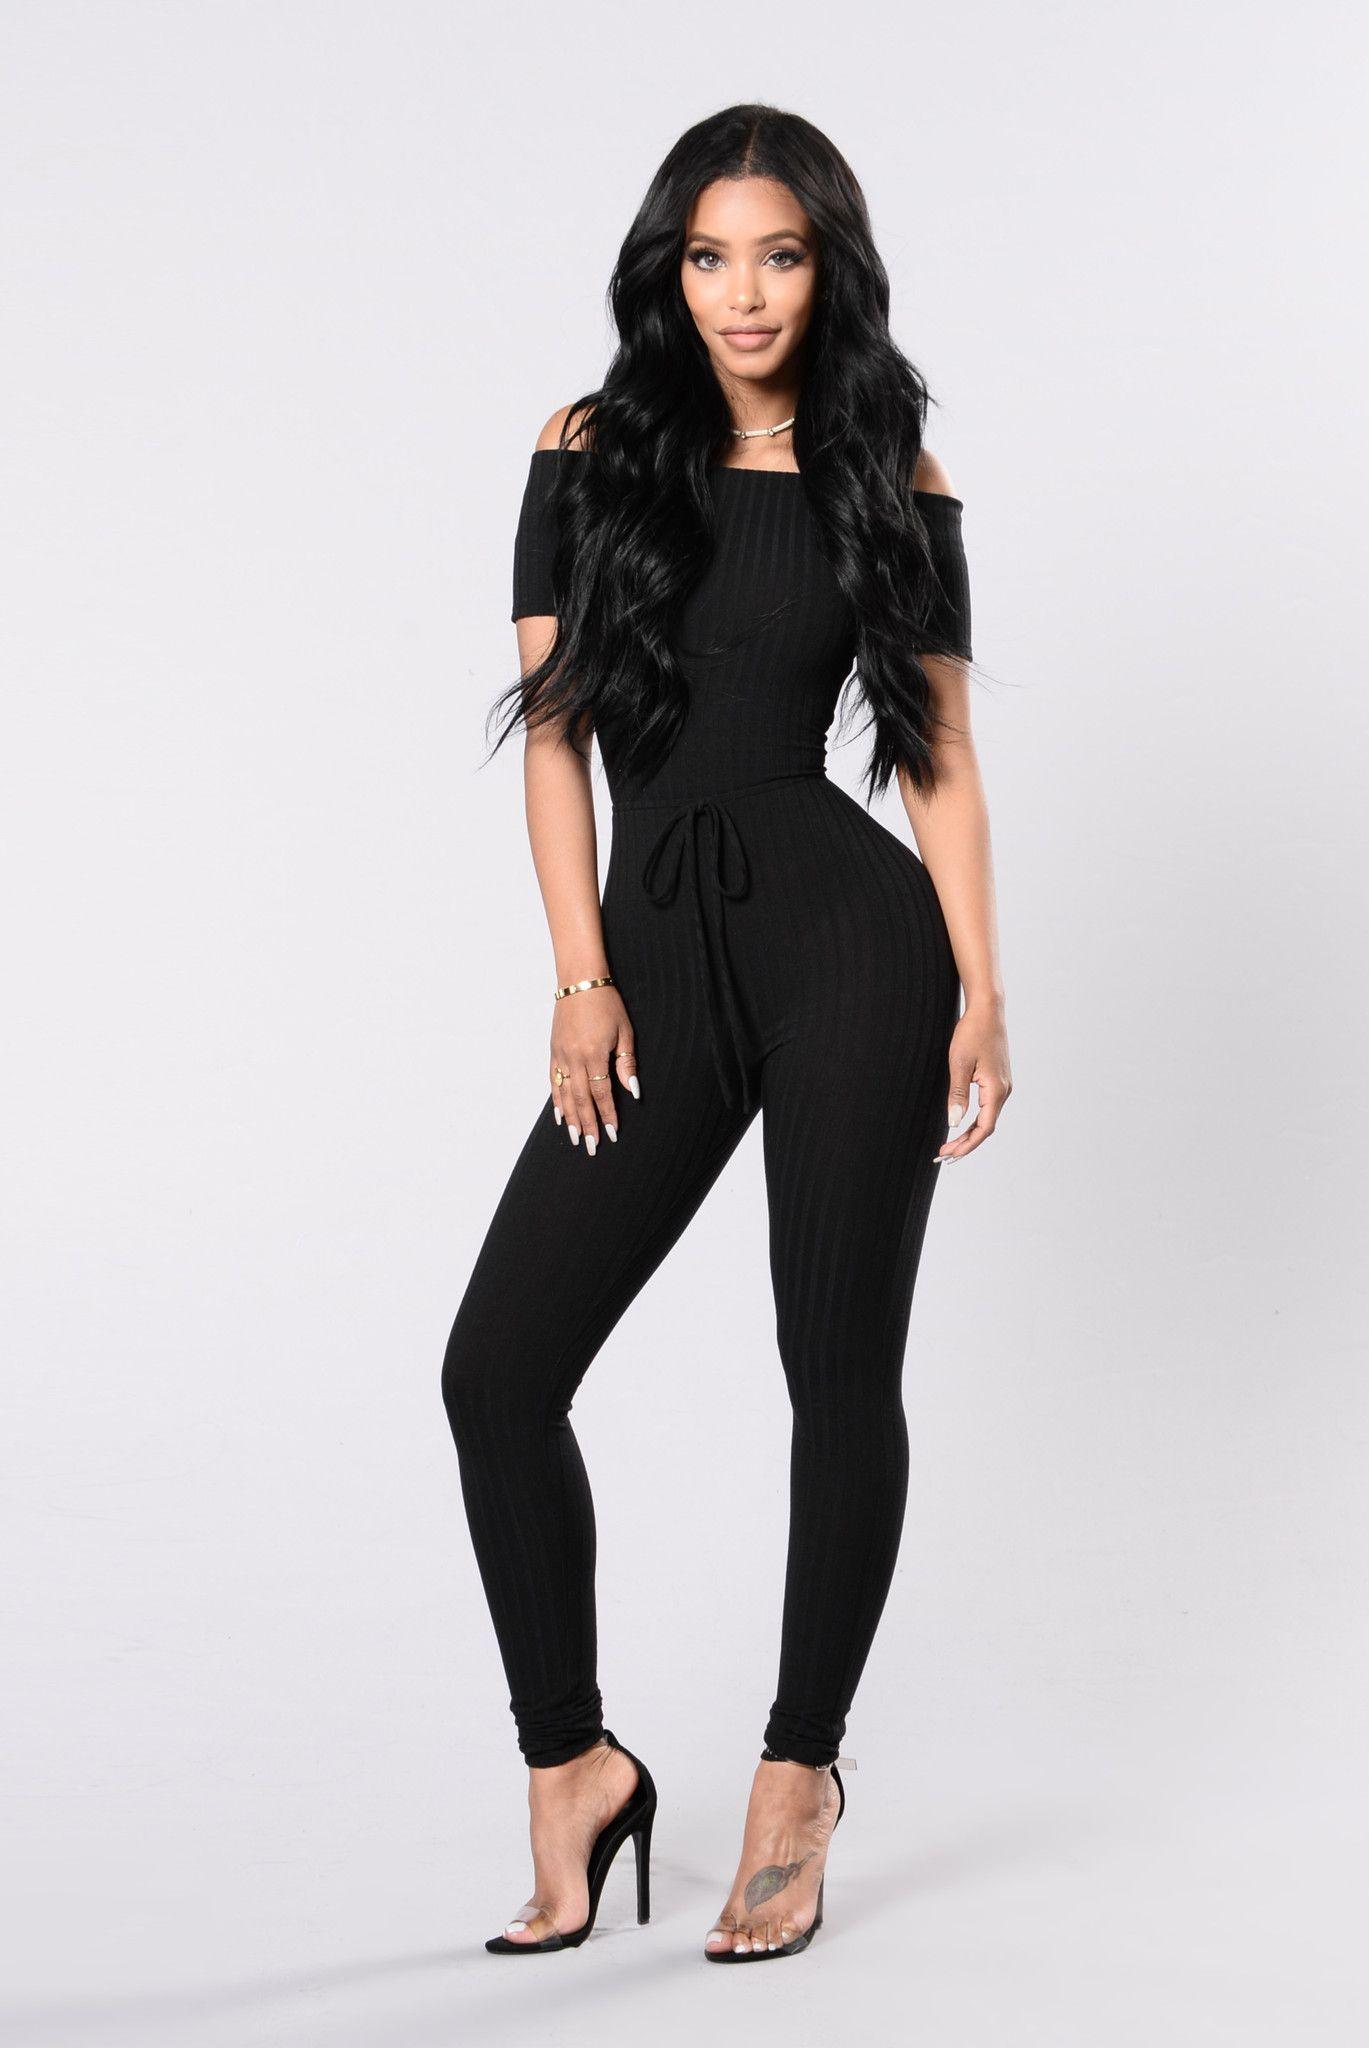 b73ae99301eb Maria Maria Jumpsuit - Black Playsuit Romper